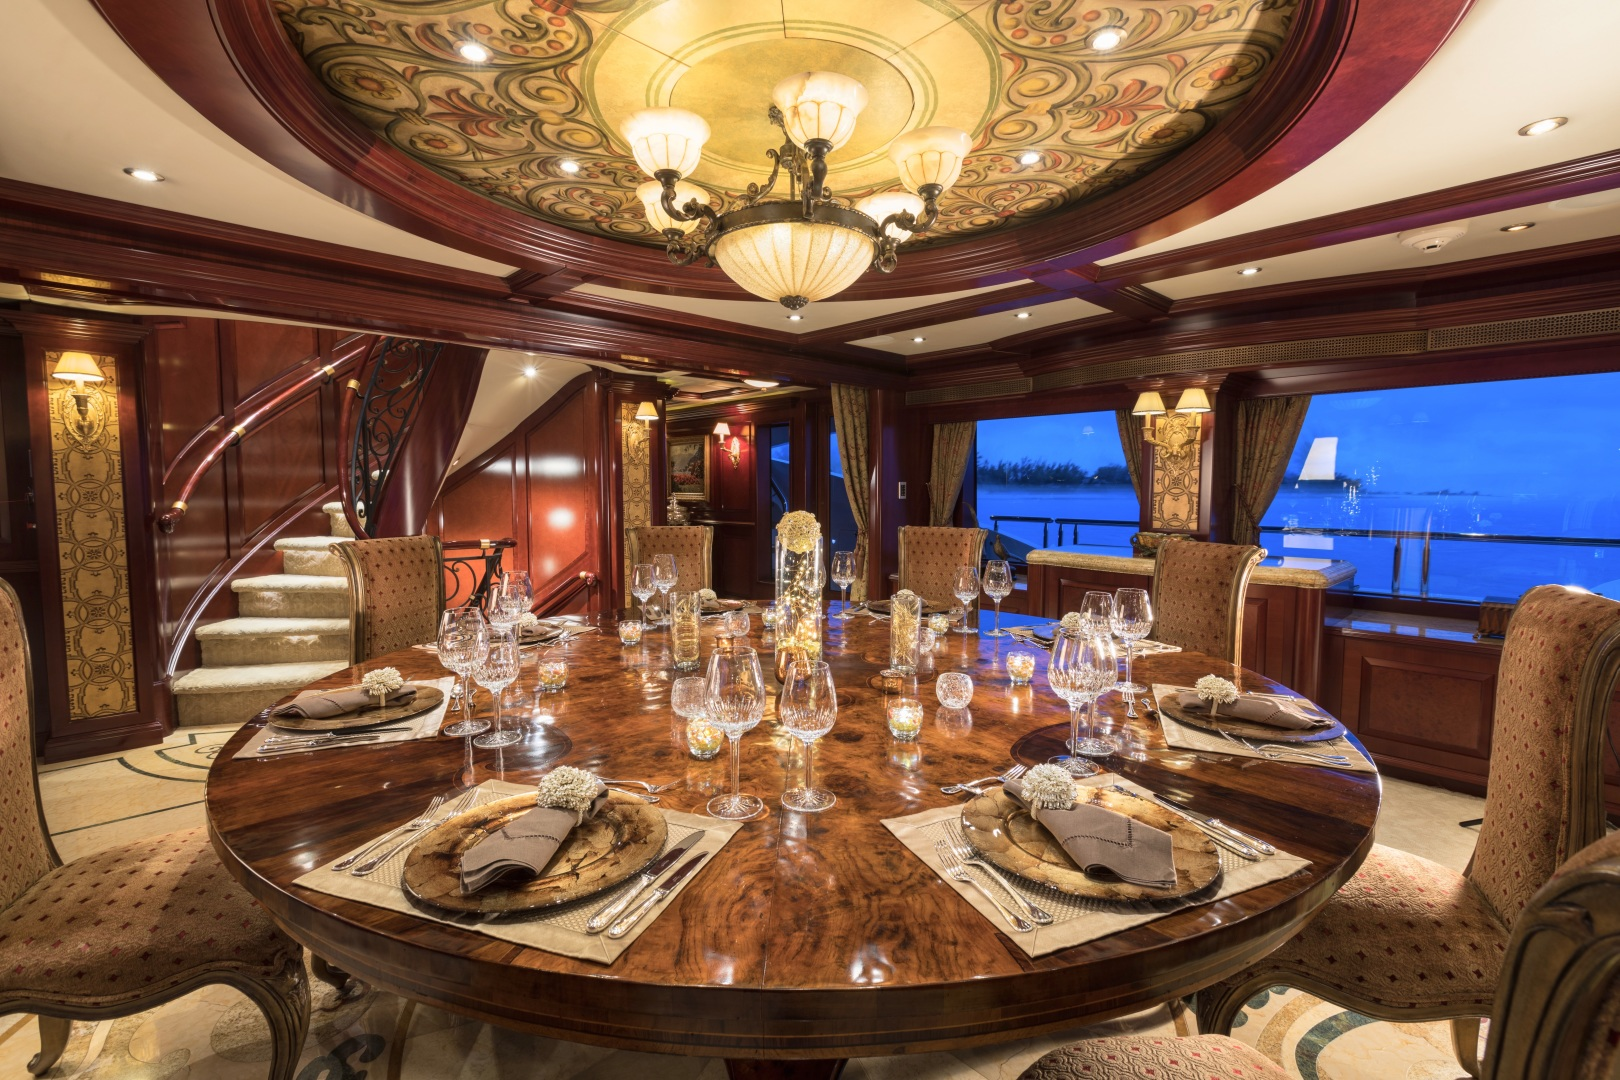 Trinity Yachts-164 Tri-deck Motor Yacht 2008-Amarula Sun Fort Lauderdale-Florida-United States-Formal Dining Salon-1513910 | Thumbnail